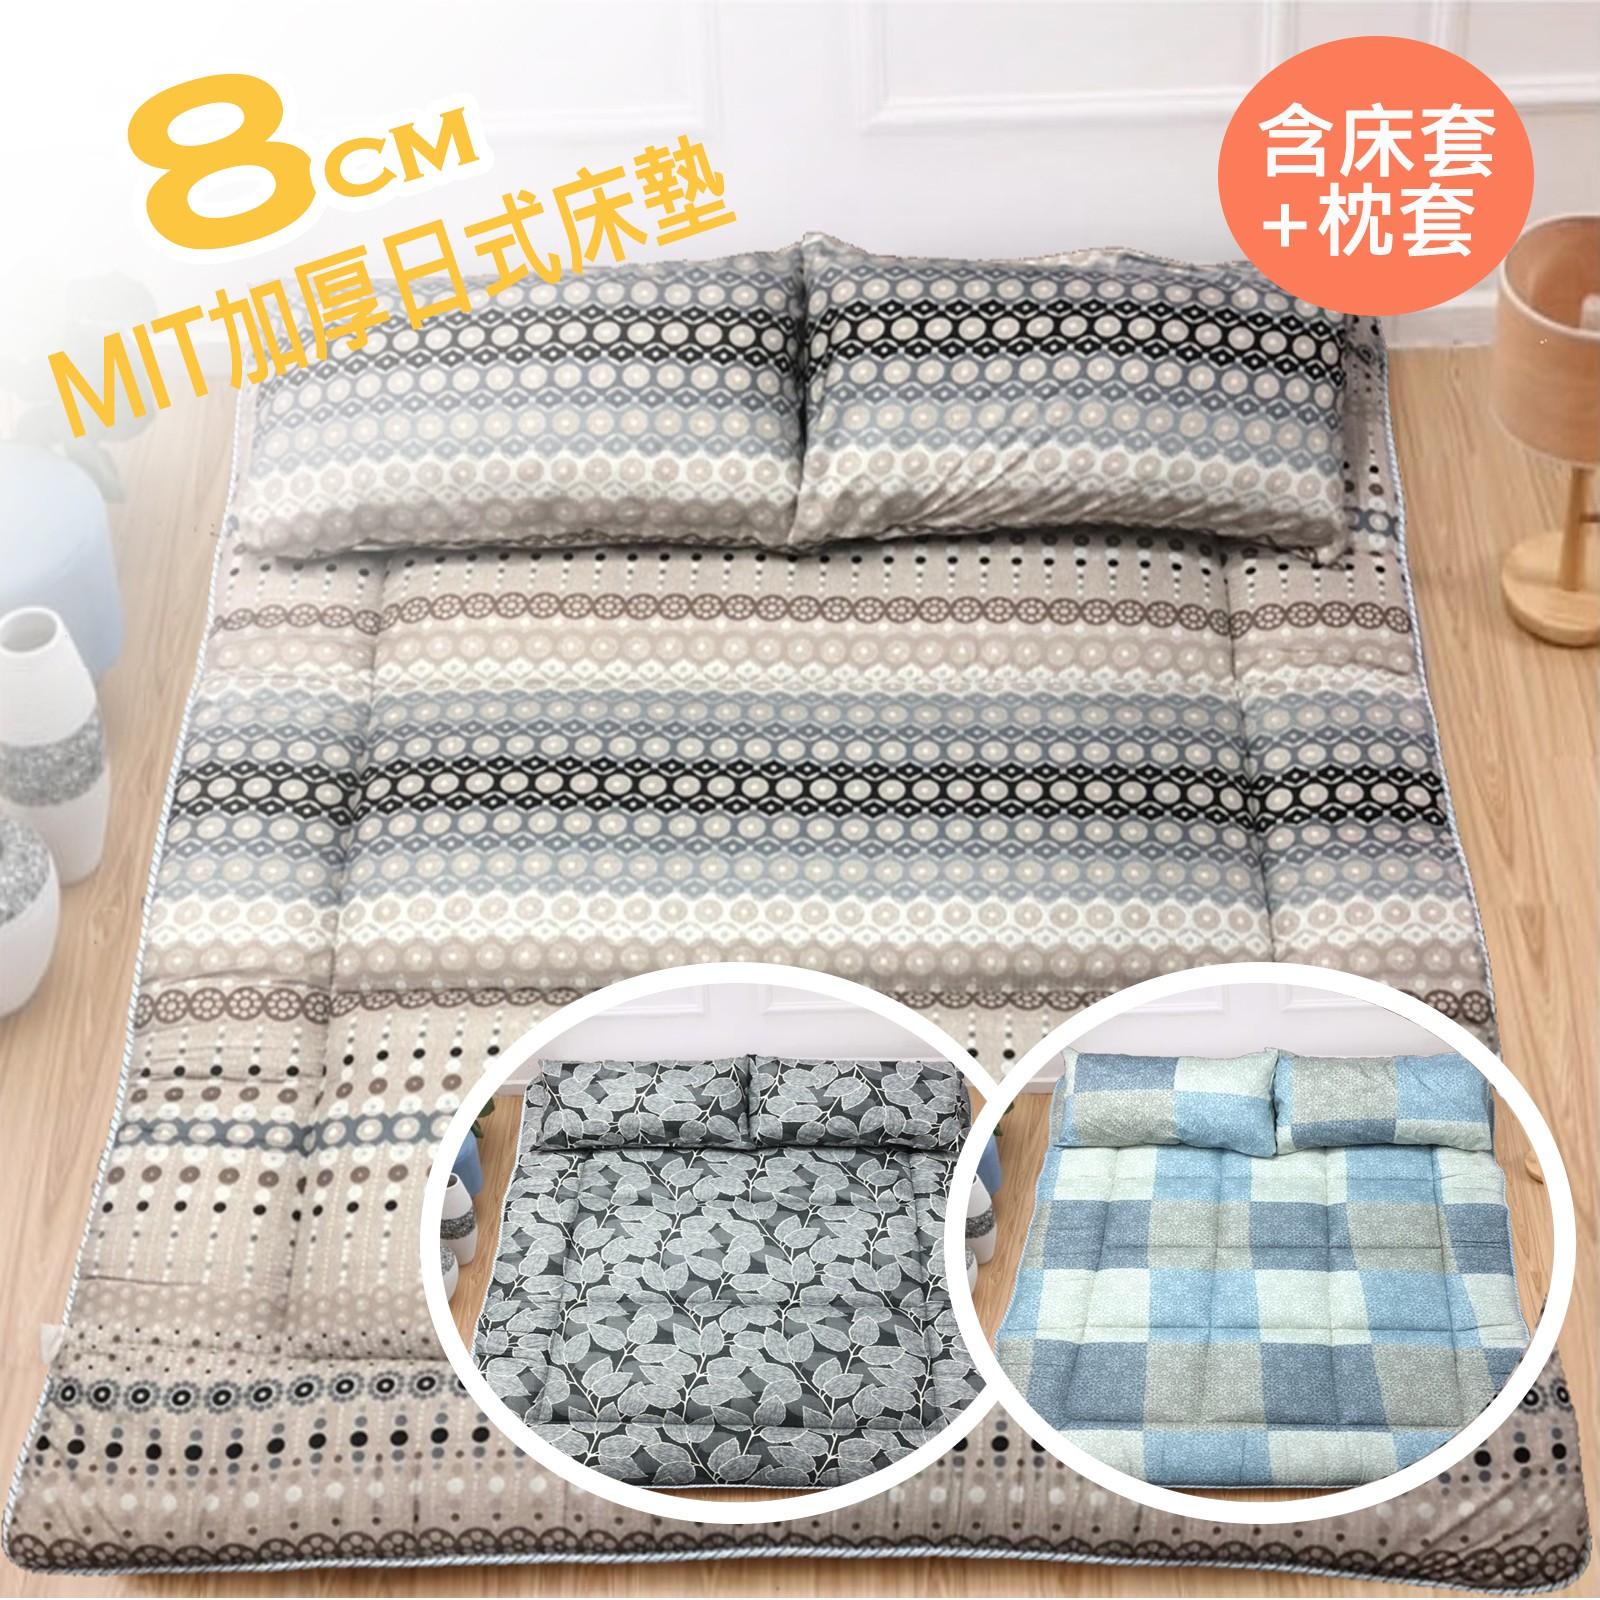 RueHong(其他)-MIT超厚8公分日式床墊-含純棉床套枕套(雙人150x188cm)